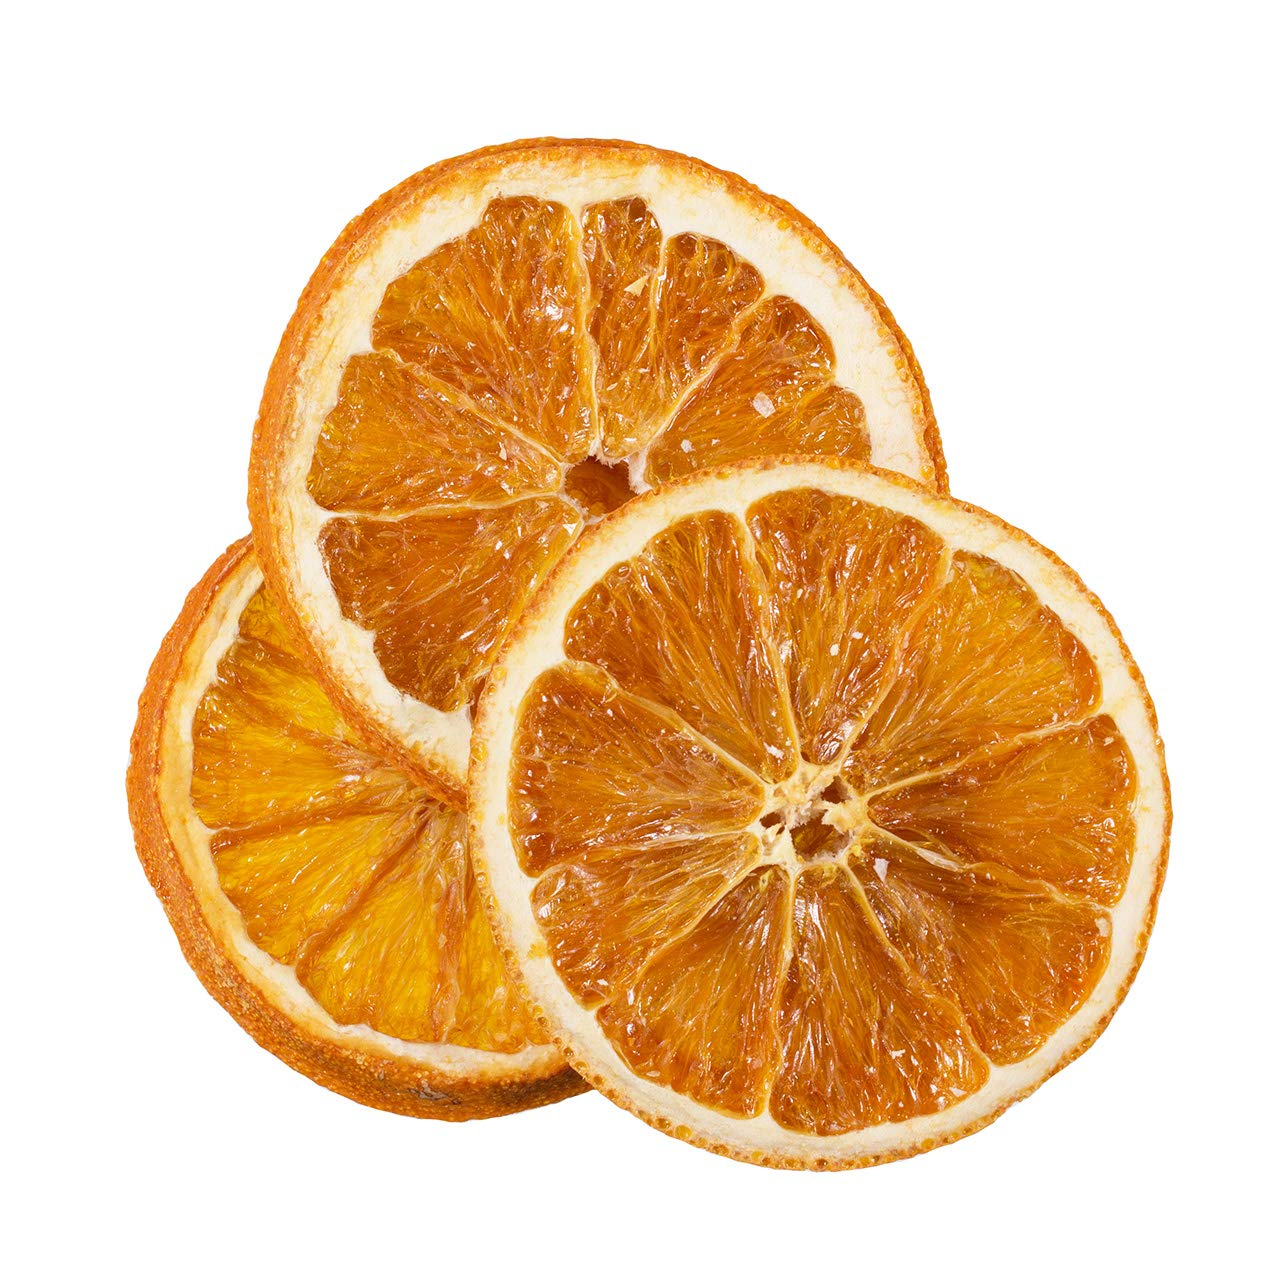 Bella Viva Orchards Organic Dried Orange Slices, Sweet no Sugar Added, 1 lb of Dried Fruit